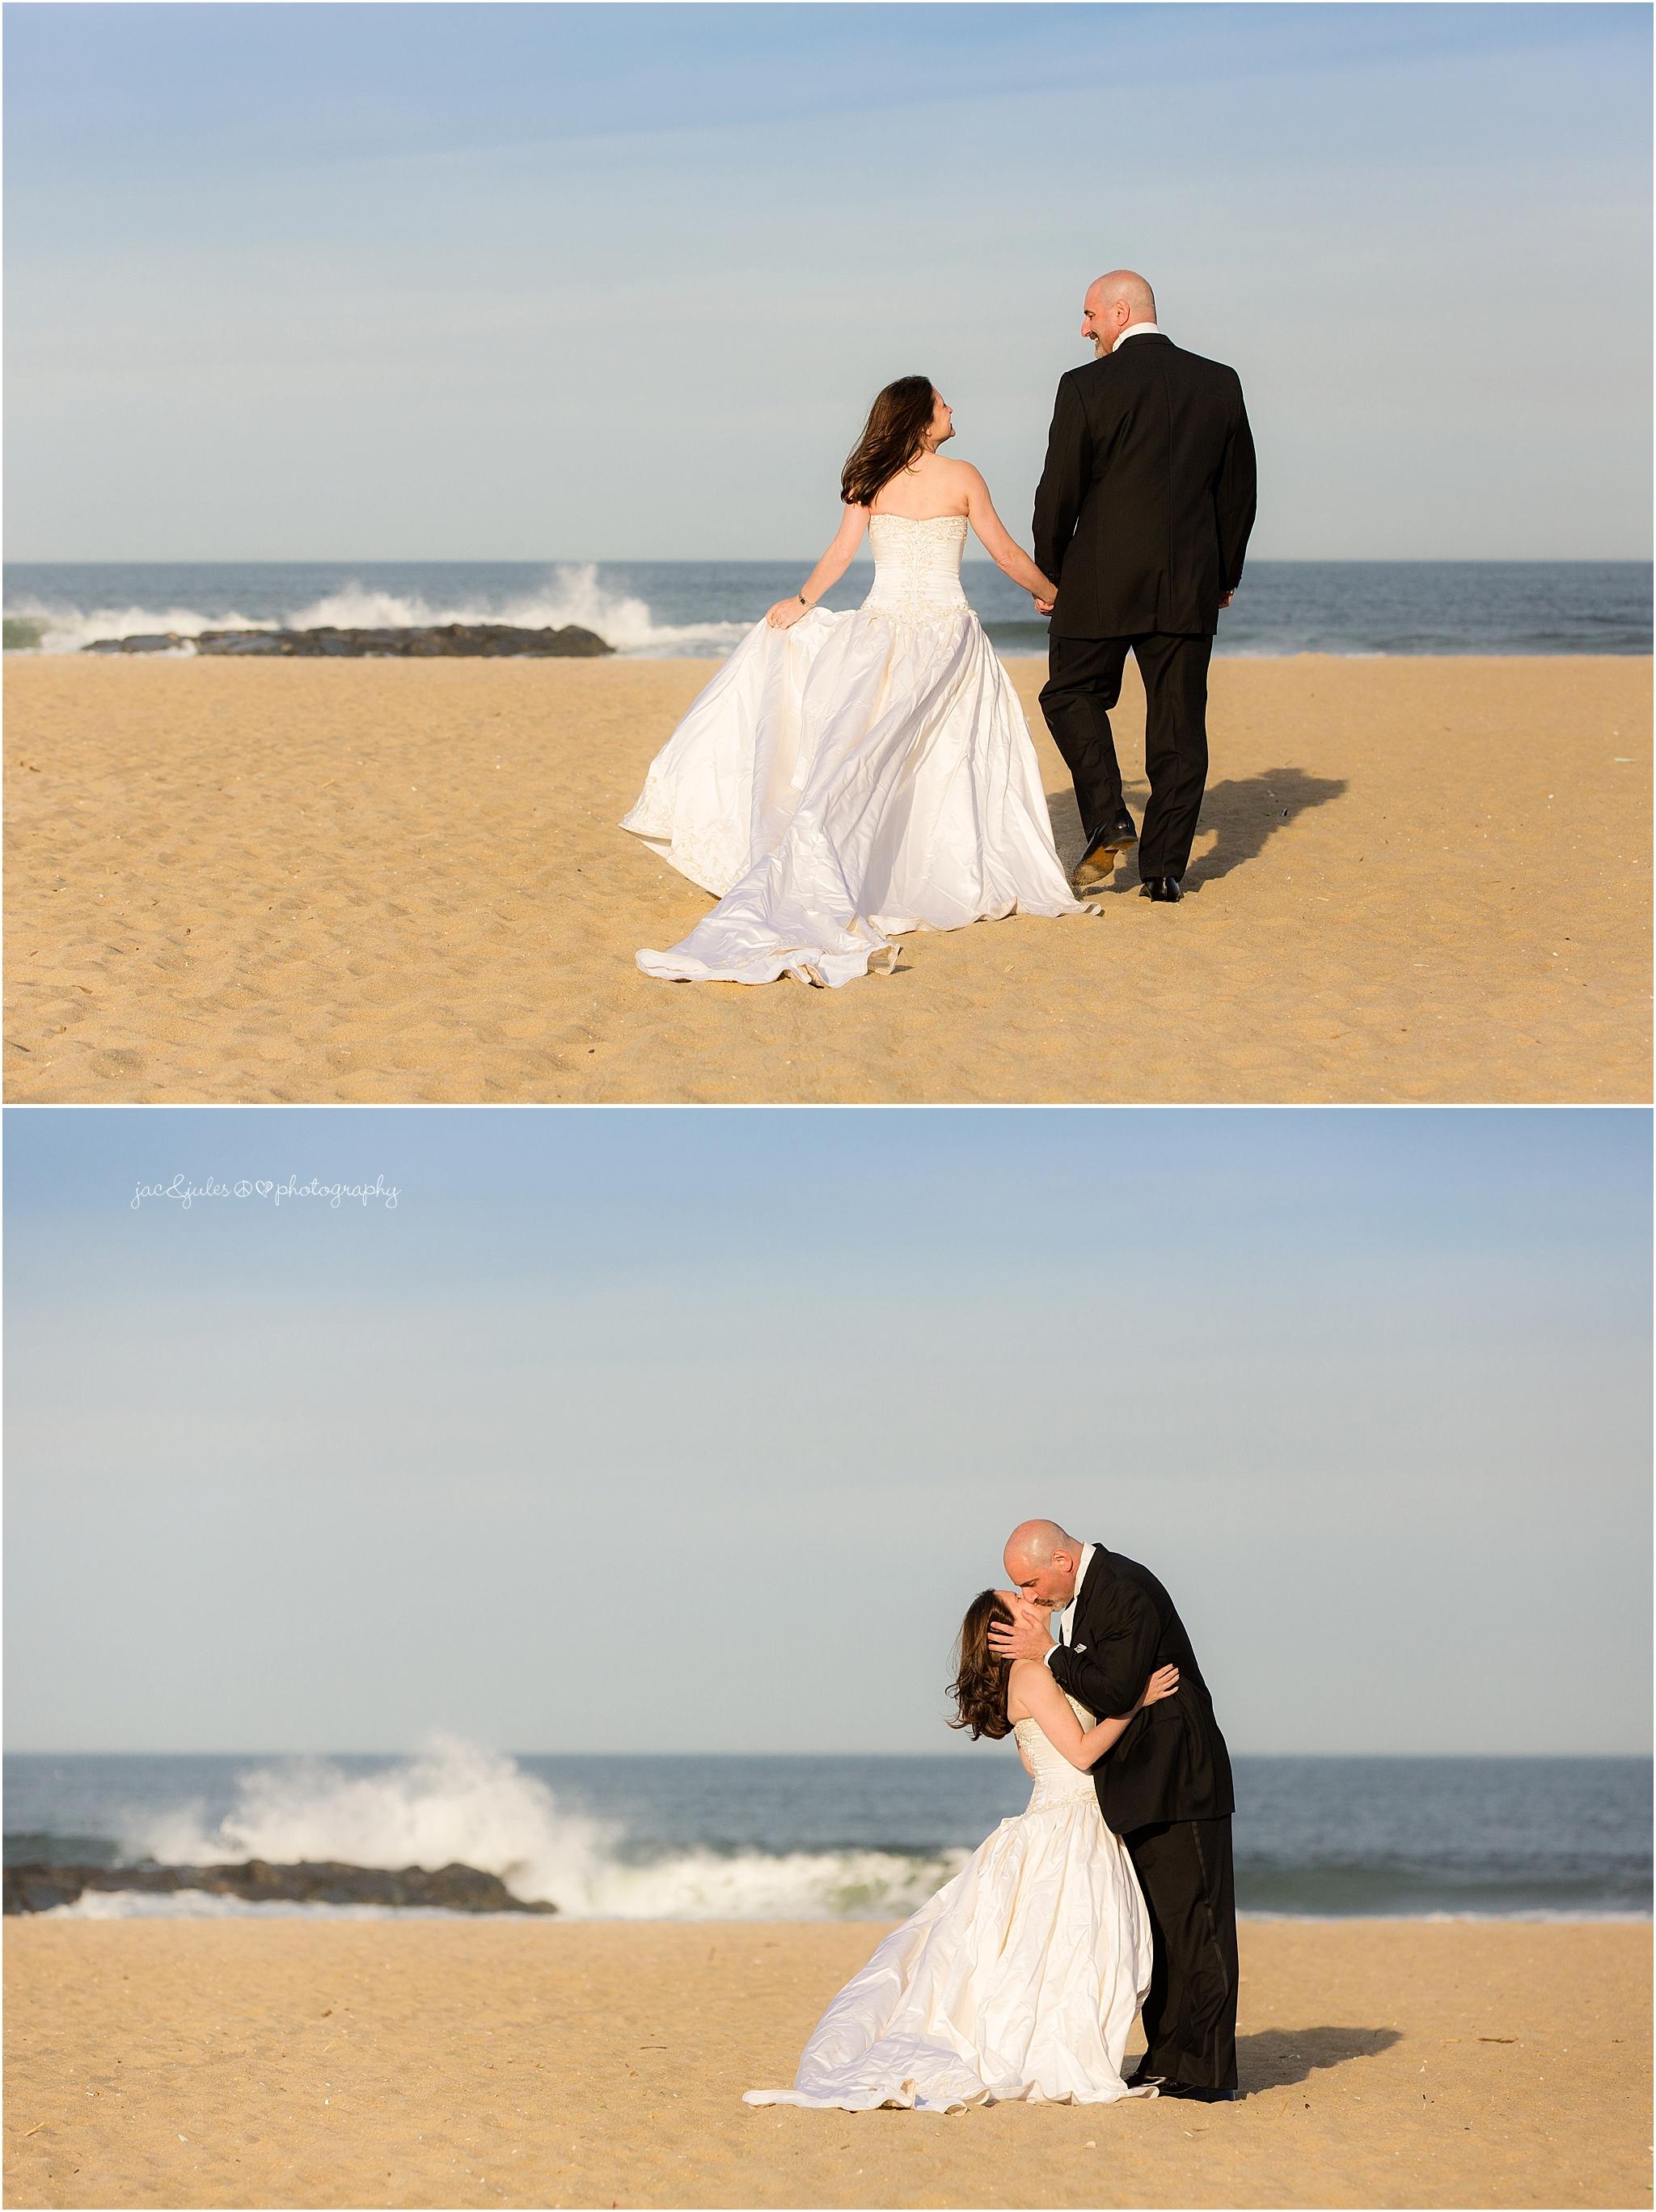 jacnjules photographs bride and groom in Asbury Park NJ